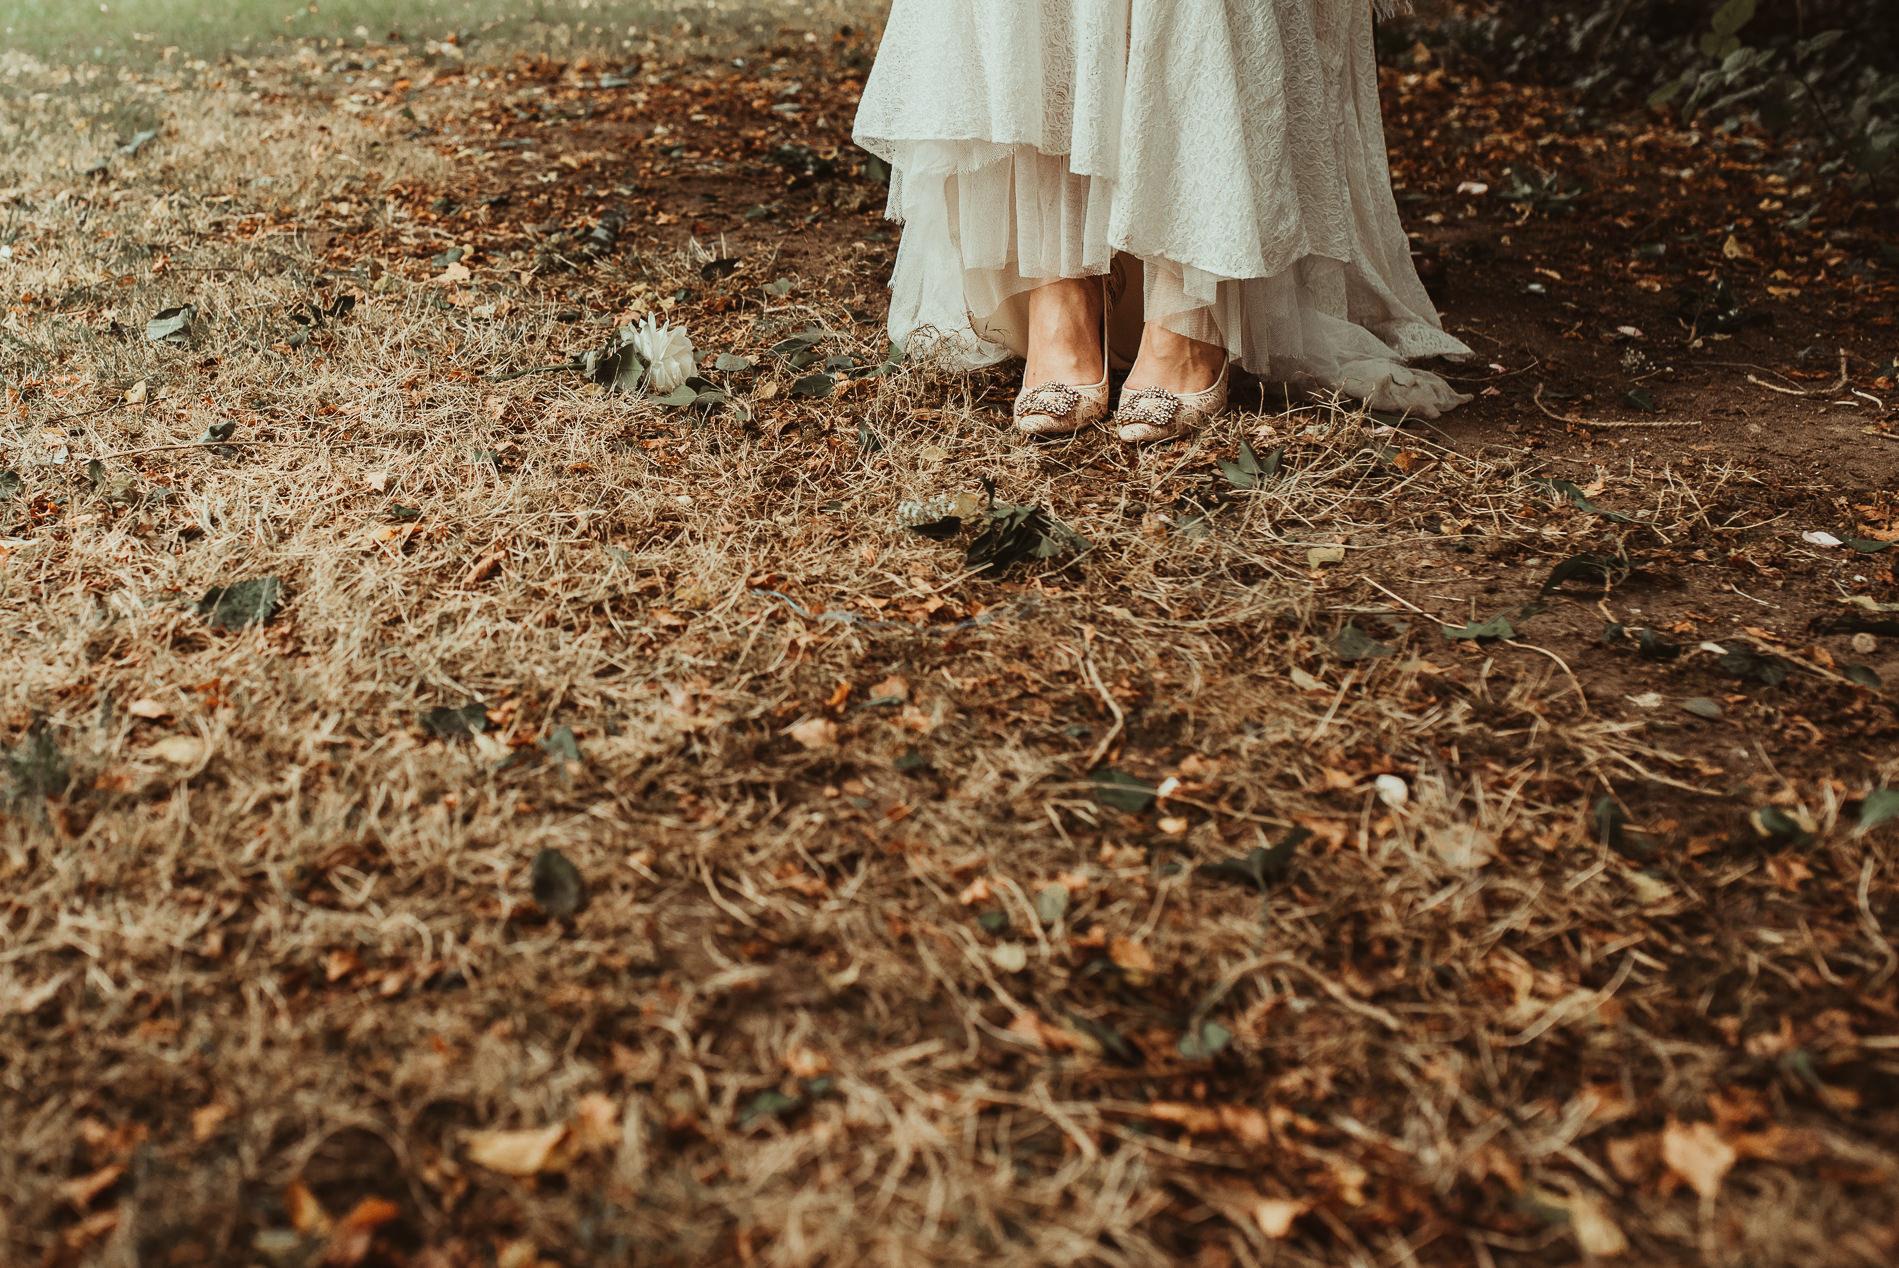 bohemian_wedding_lawshall_church_garden60